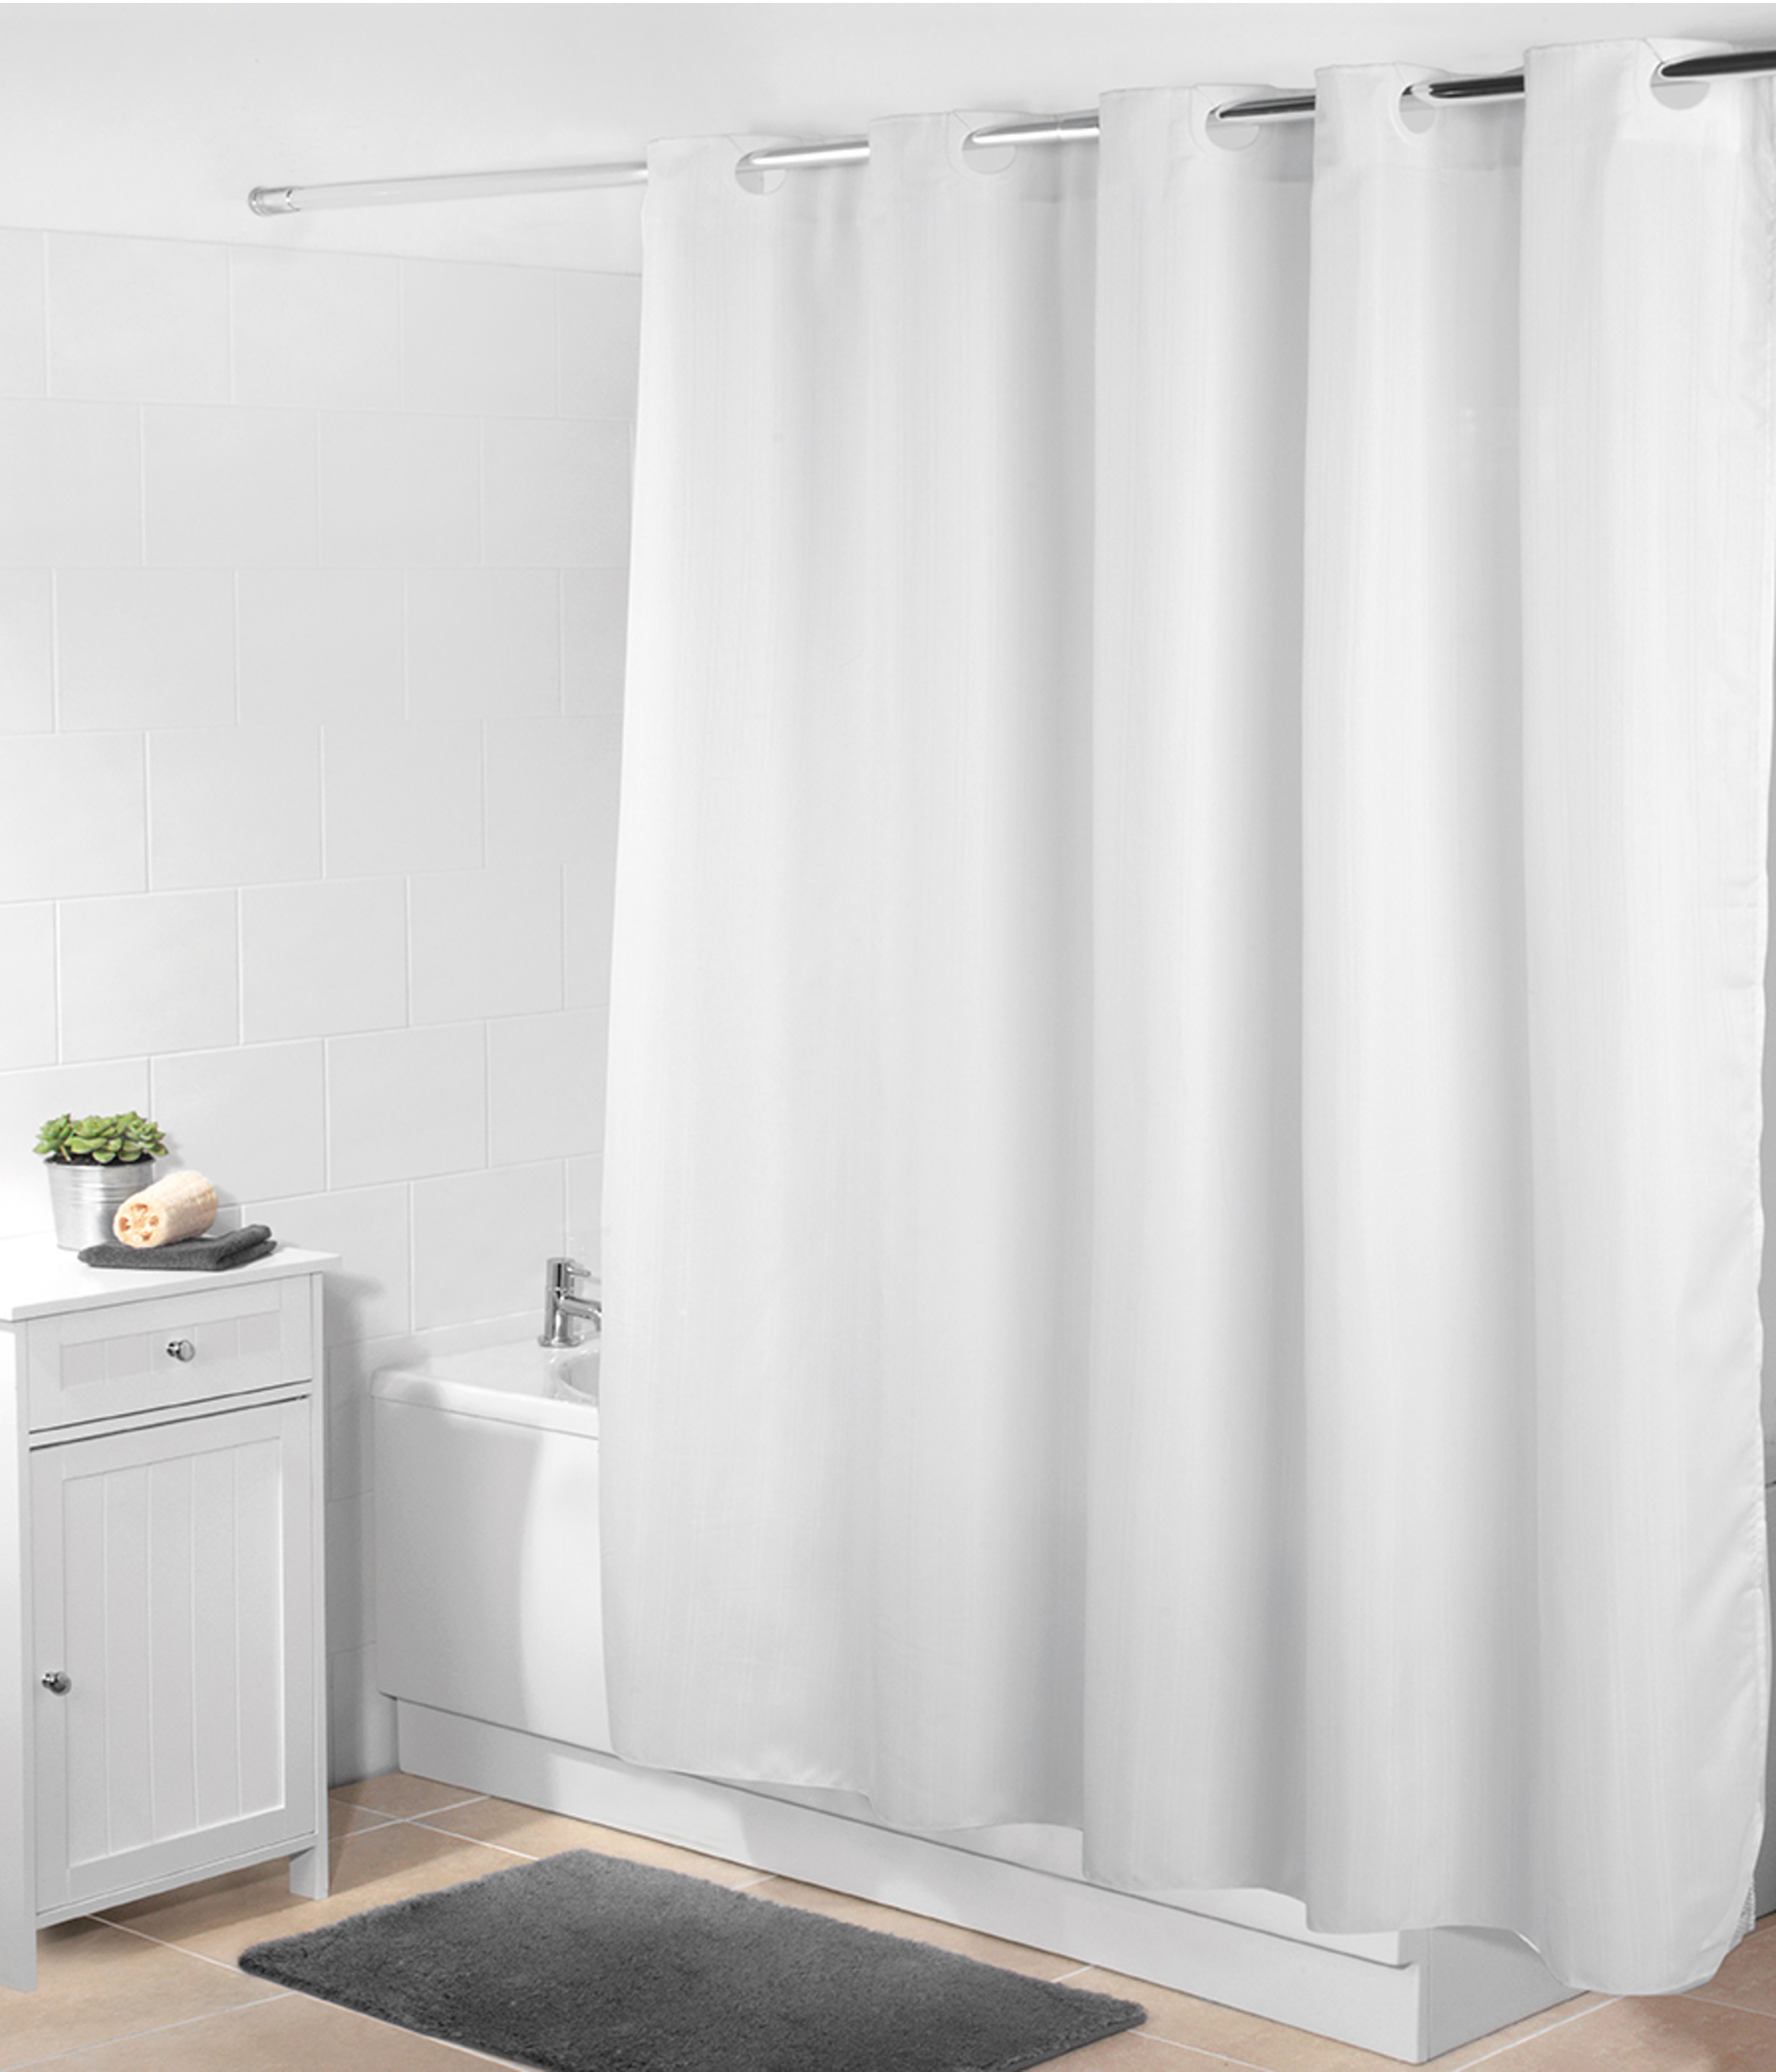 Beldray Jacquard Striped Hookless Shower Curtain 180 X 185 Cm White Thumbnail 1